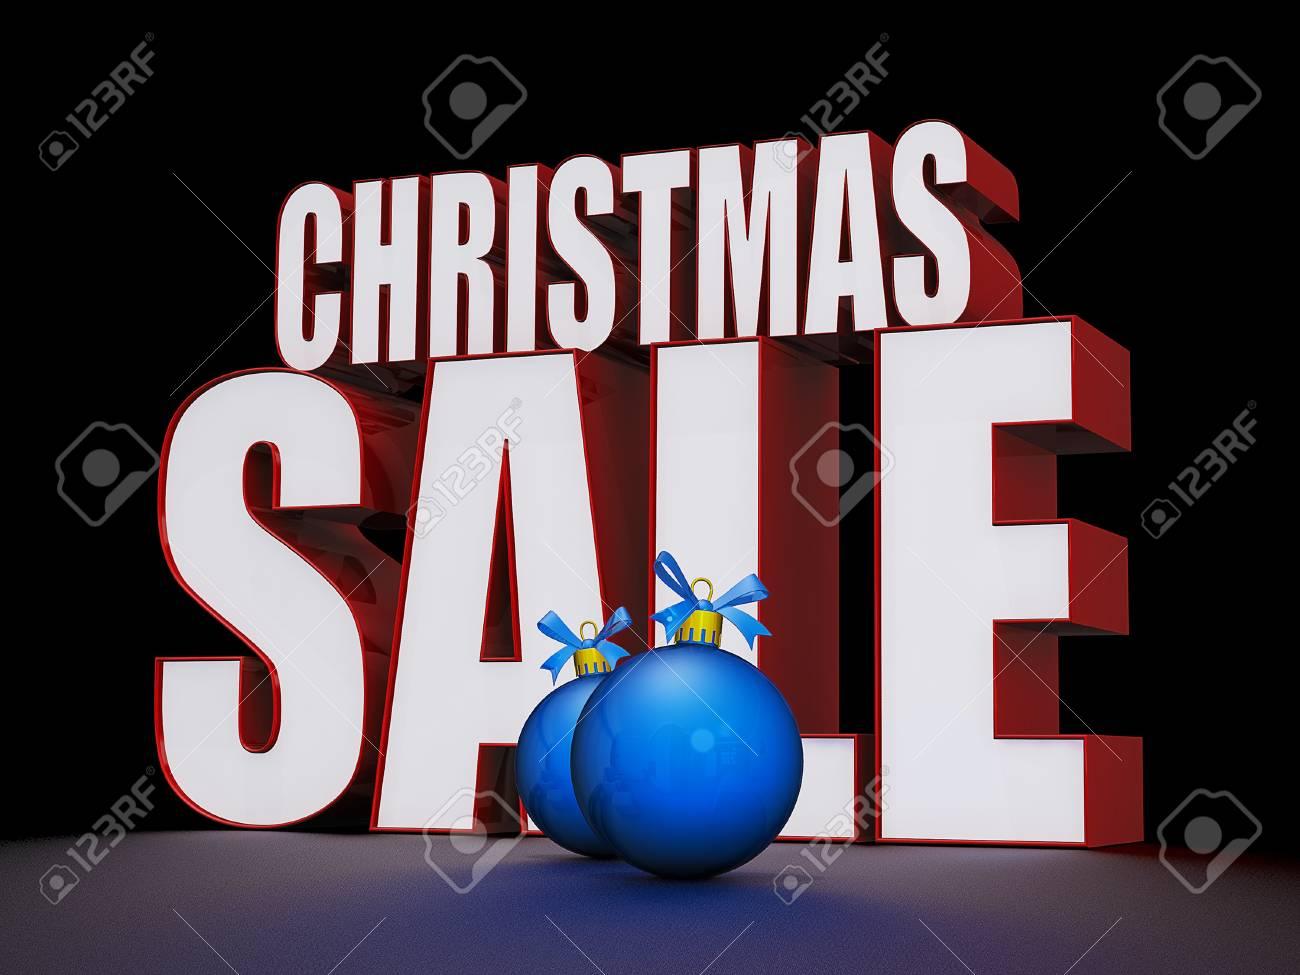 Christmas Sale text on a shiny Black background Stock Photo - 16147948